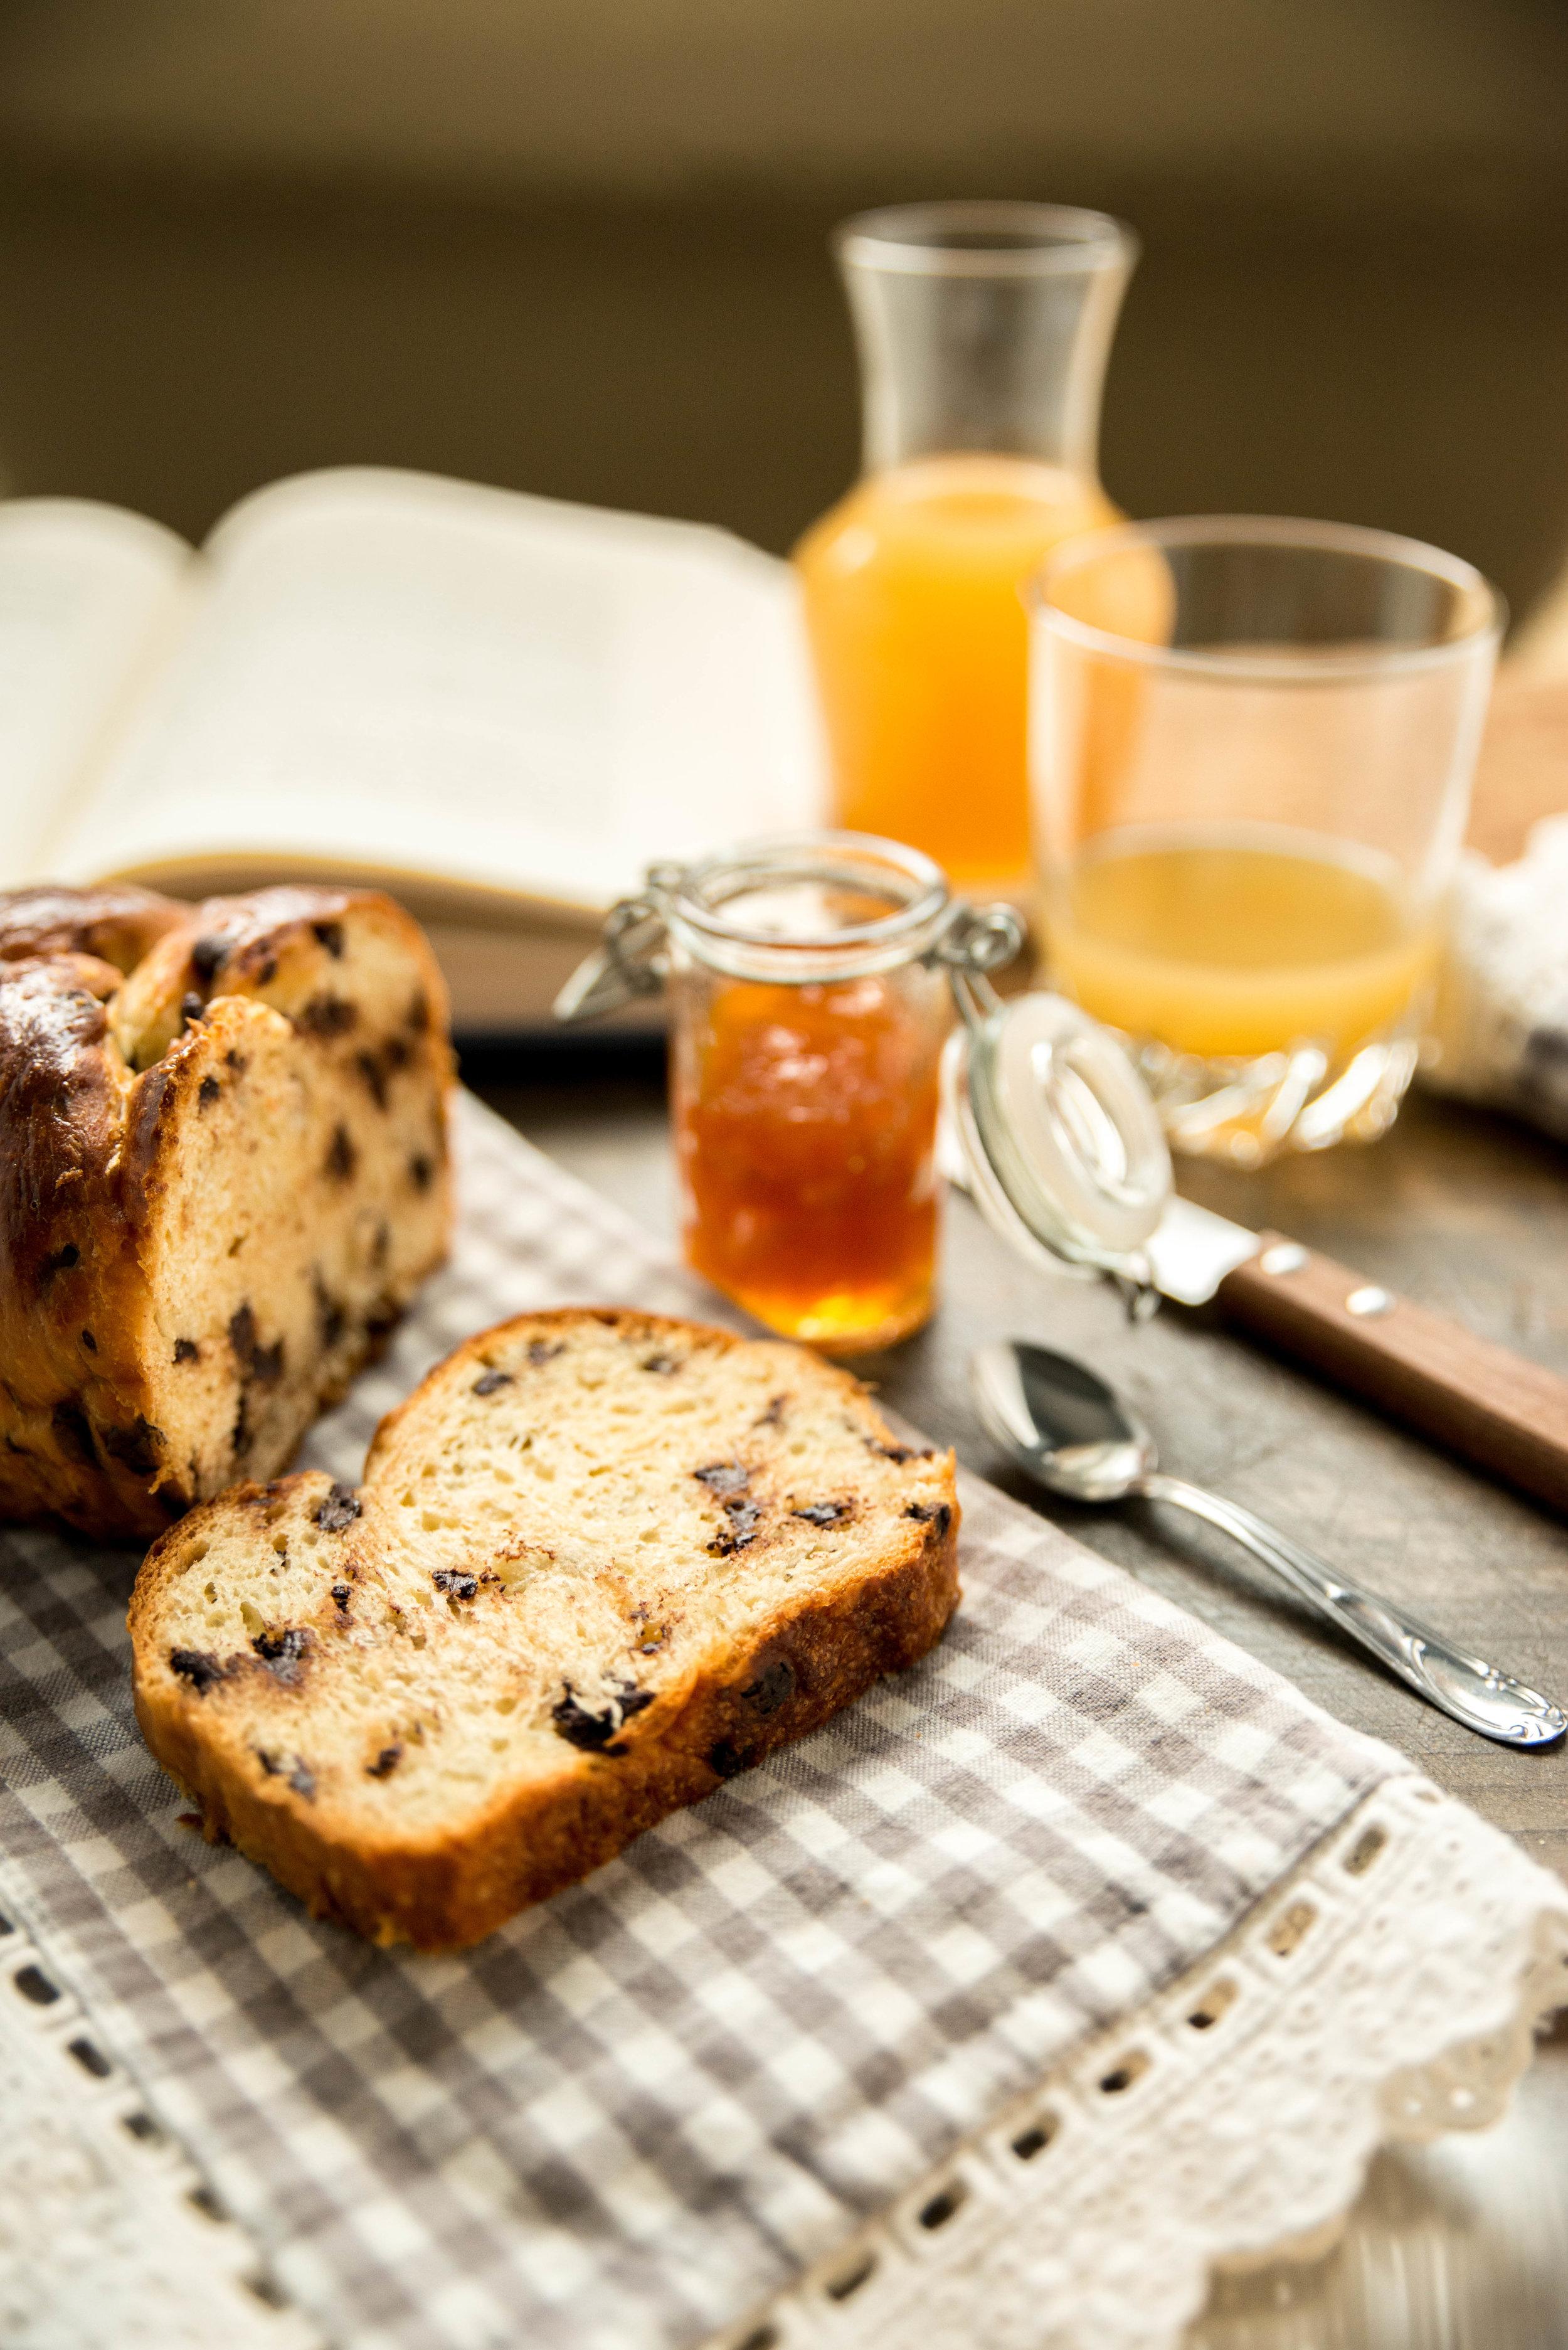 French breakfast / Food & drink